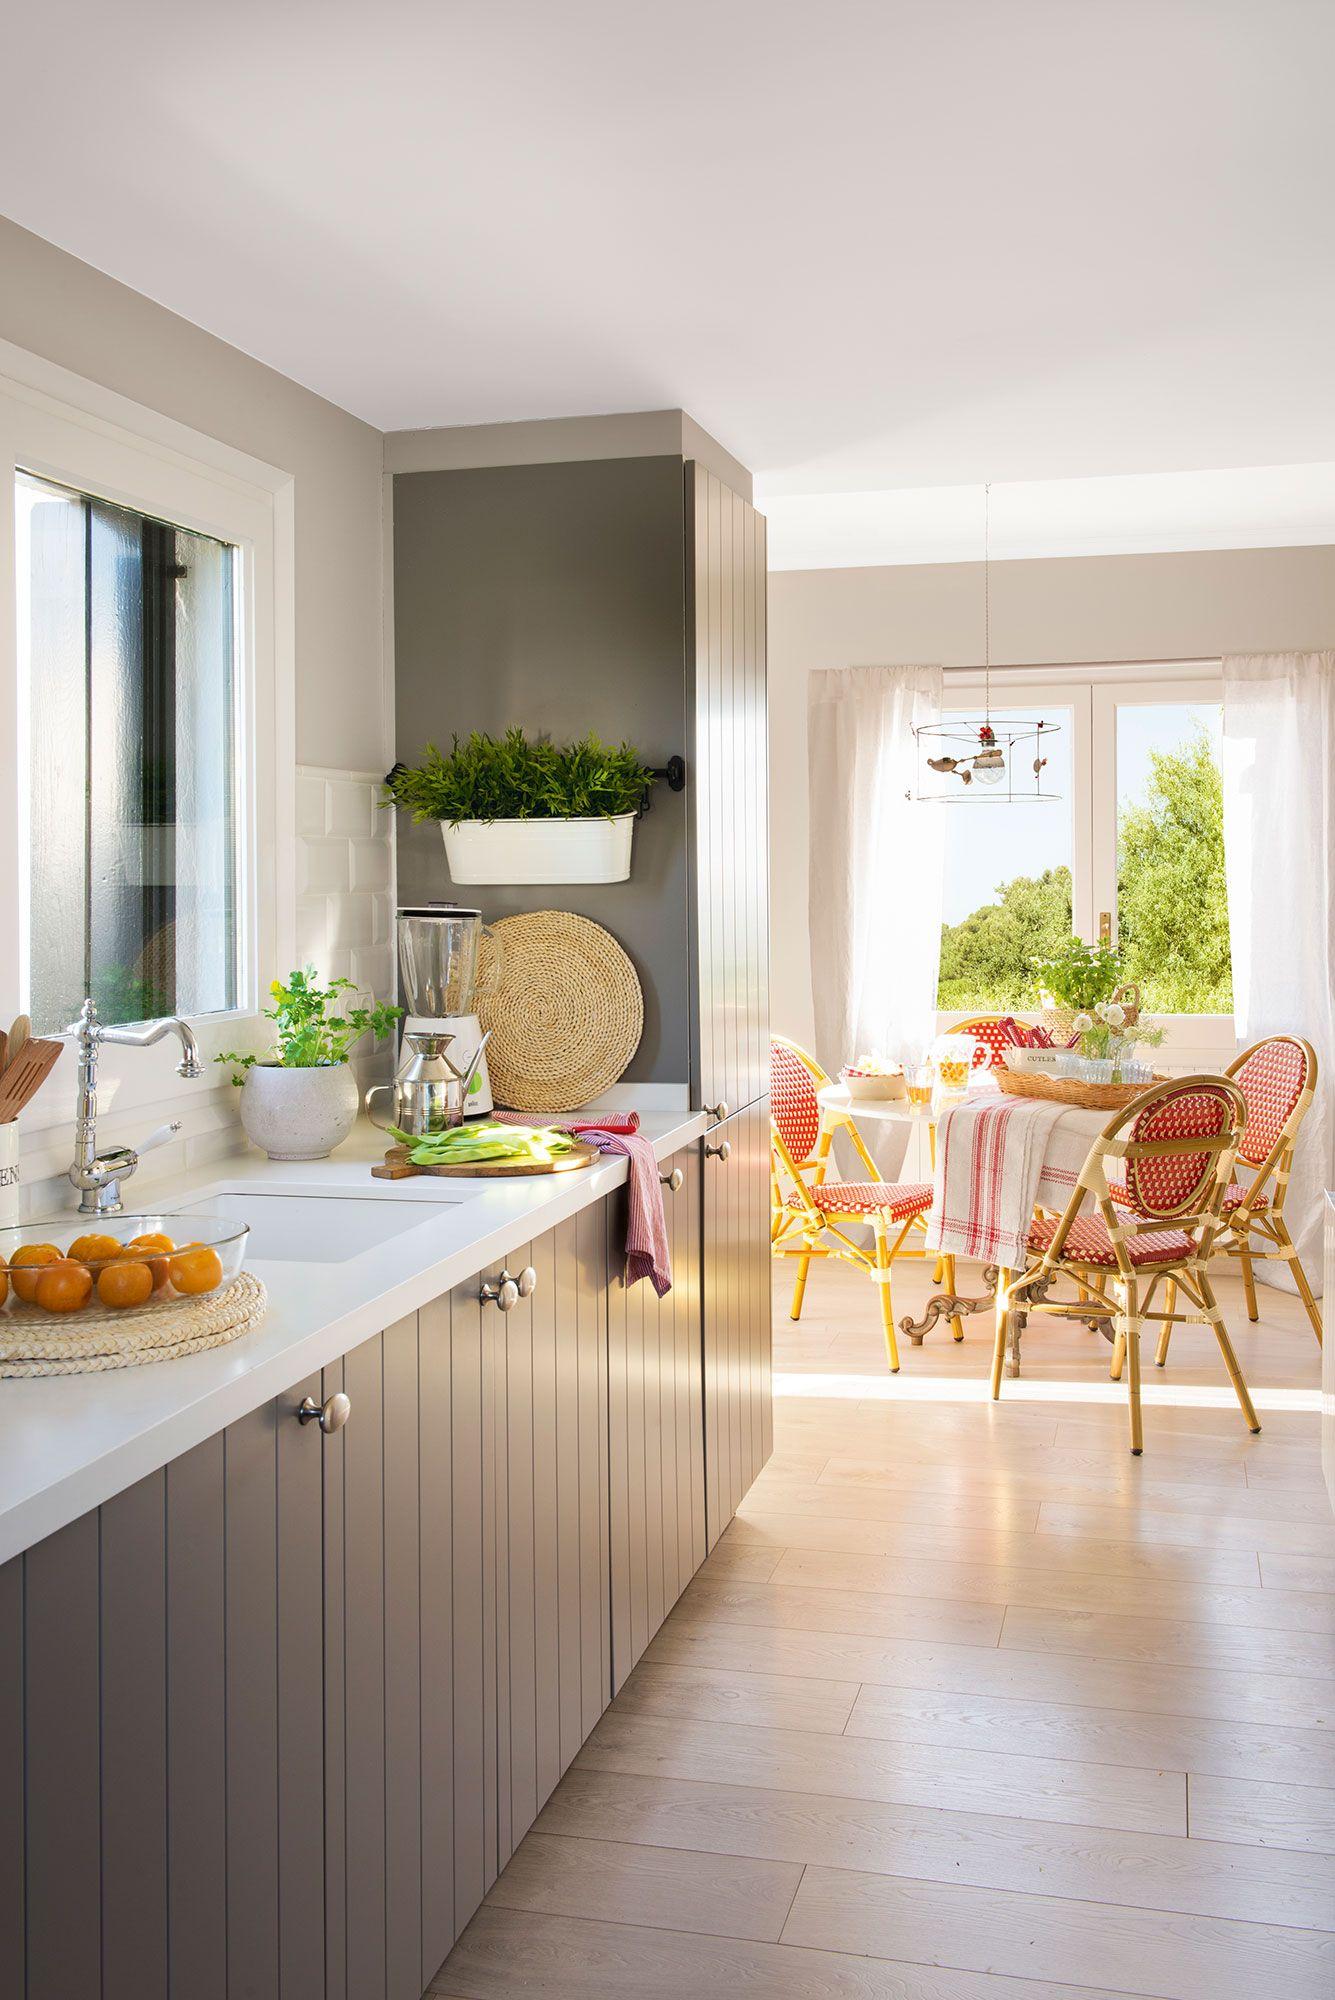 Renovar La Cocina Sin Obras 10 Reformas Low Cost Kitchen DesignsKitchen